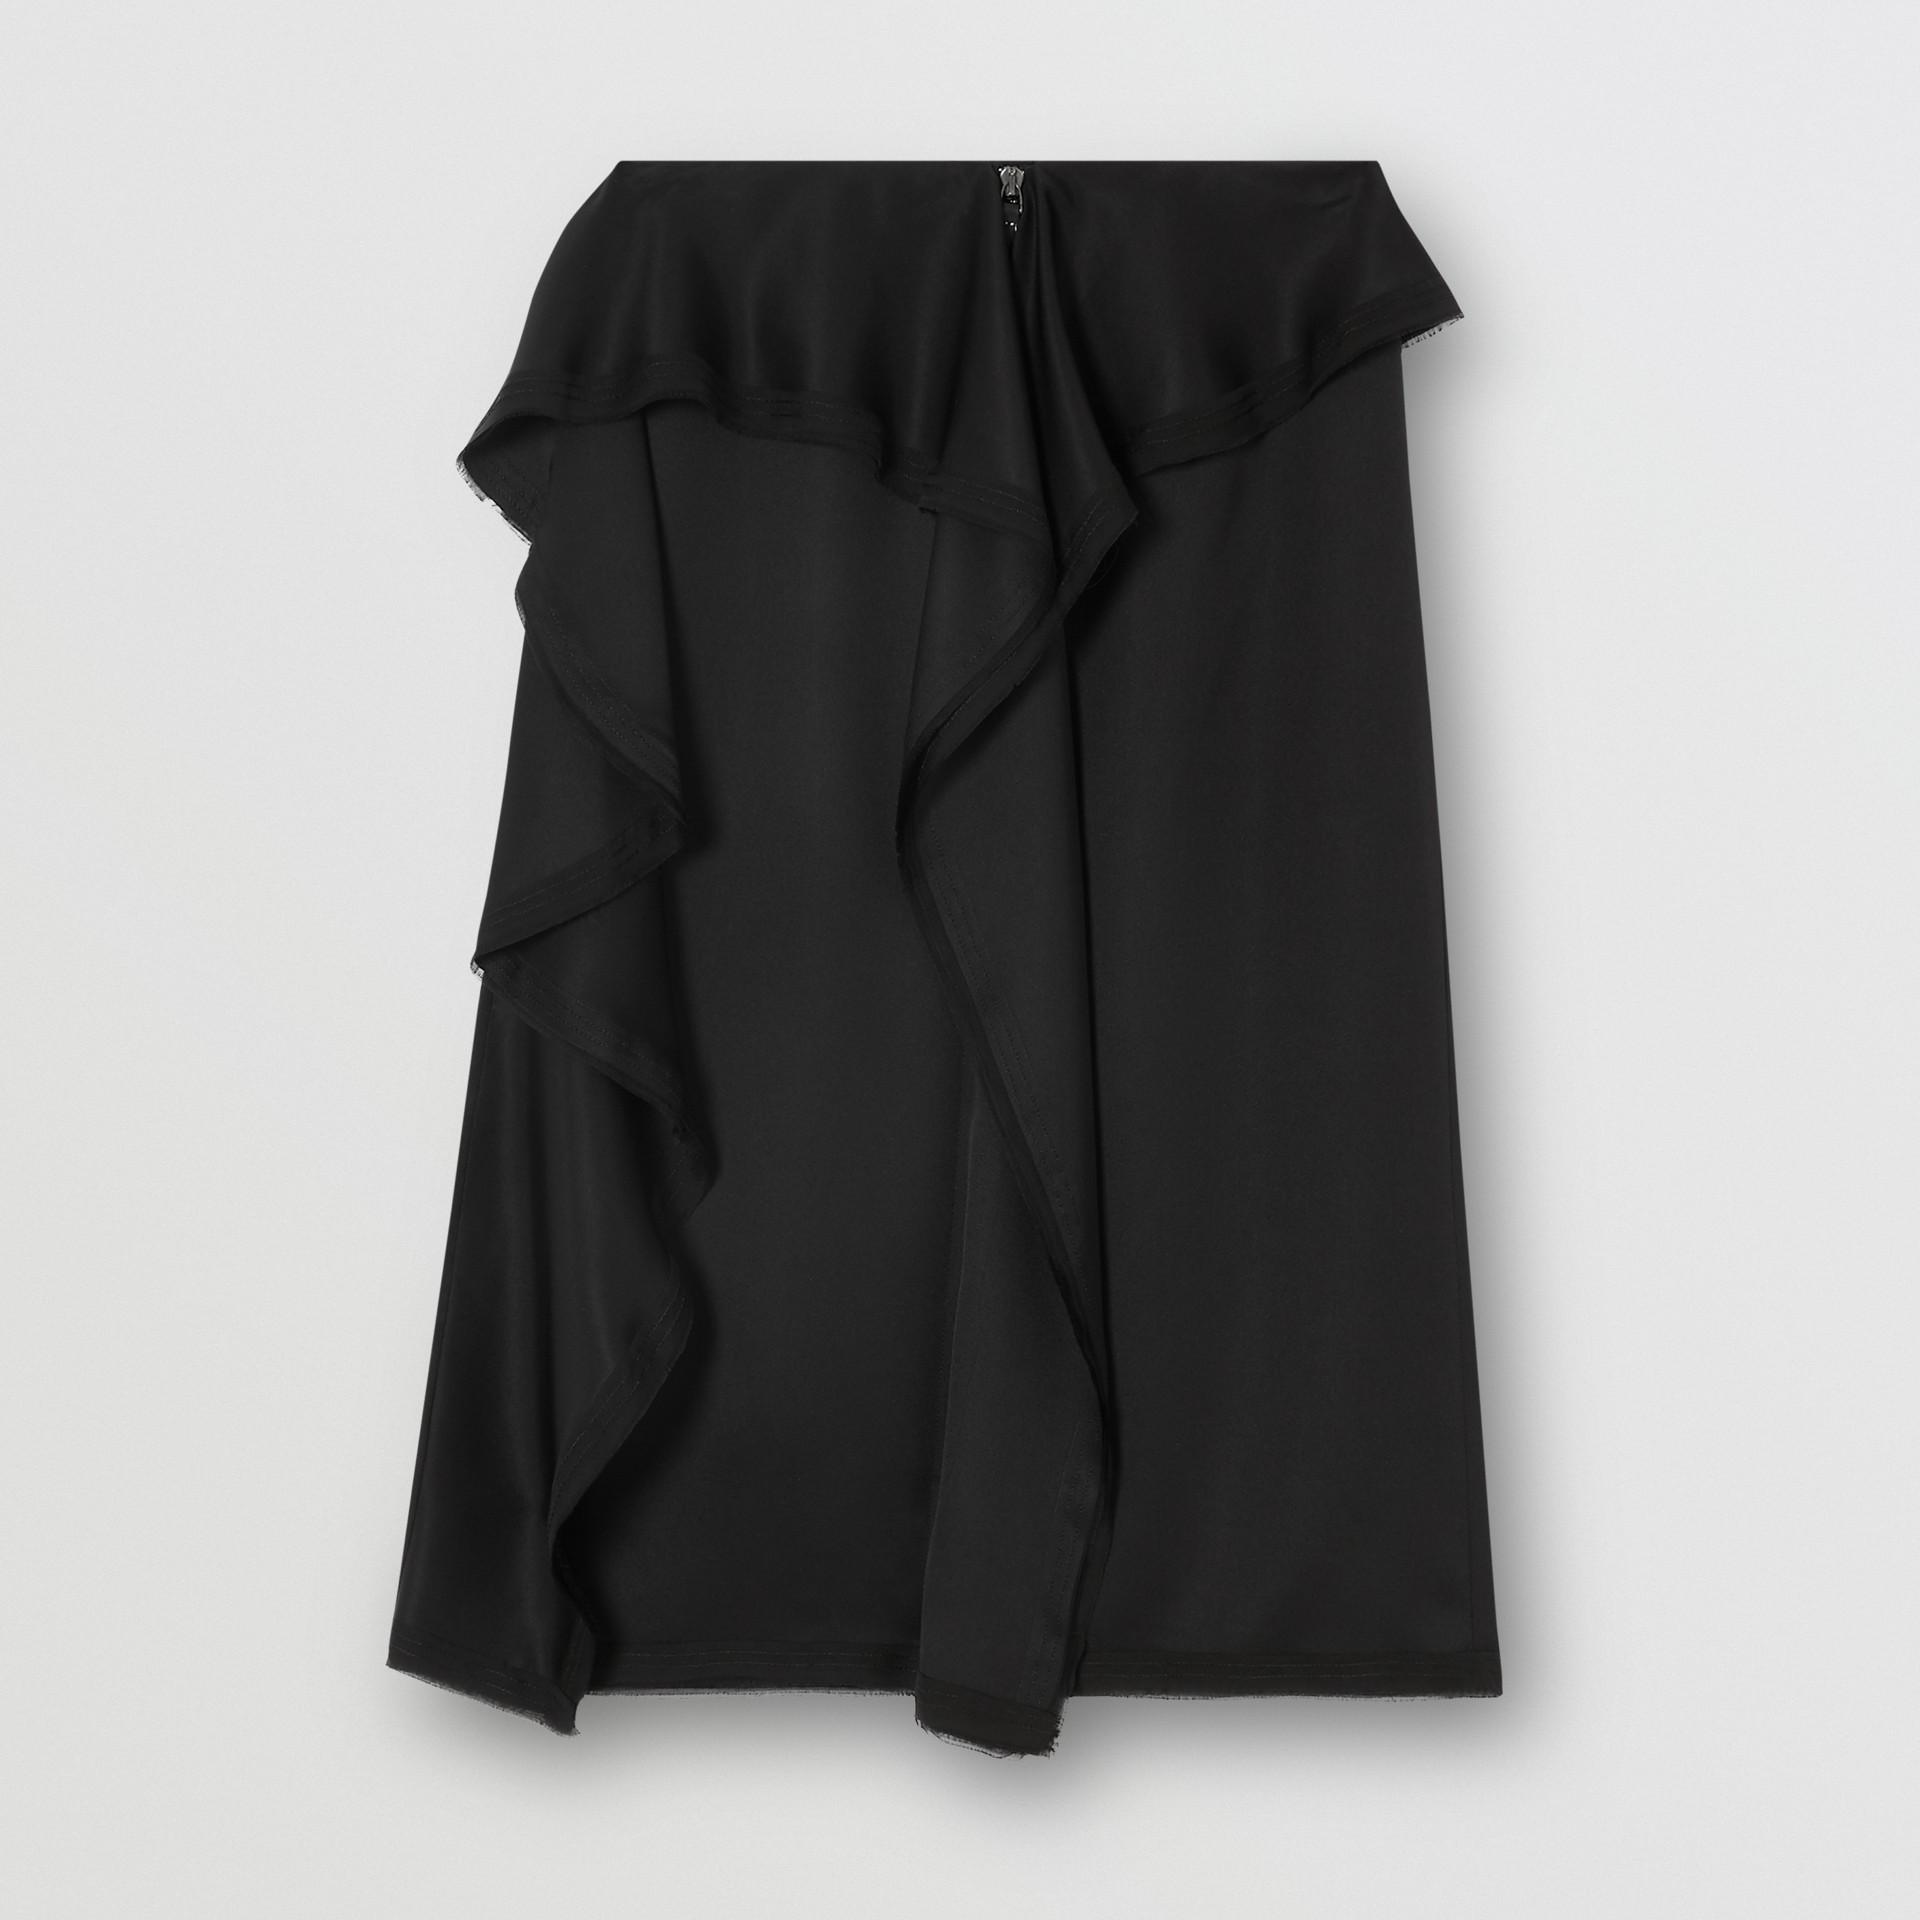 Ruffle Detail Silk Satin Pencil Skirt in Black - Women | Burberry United Kingdom - gallery image 3